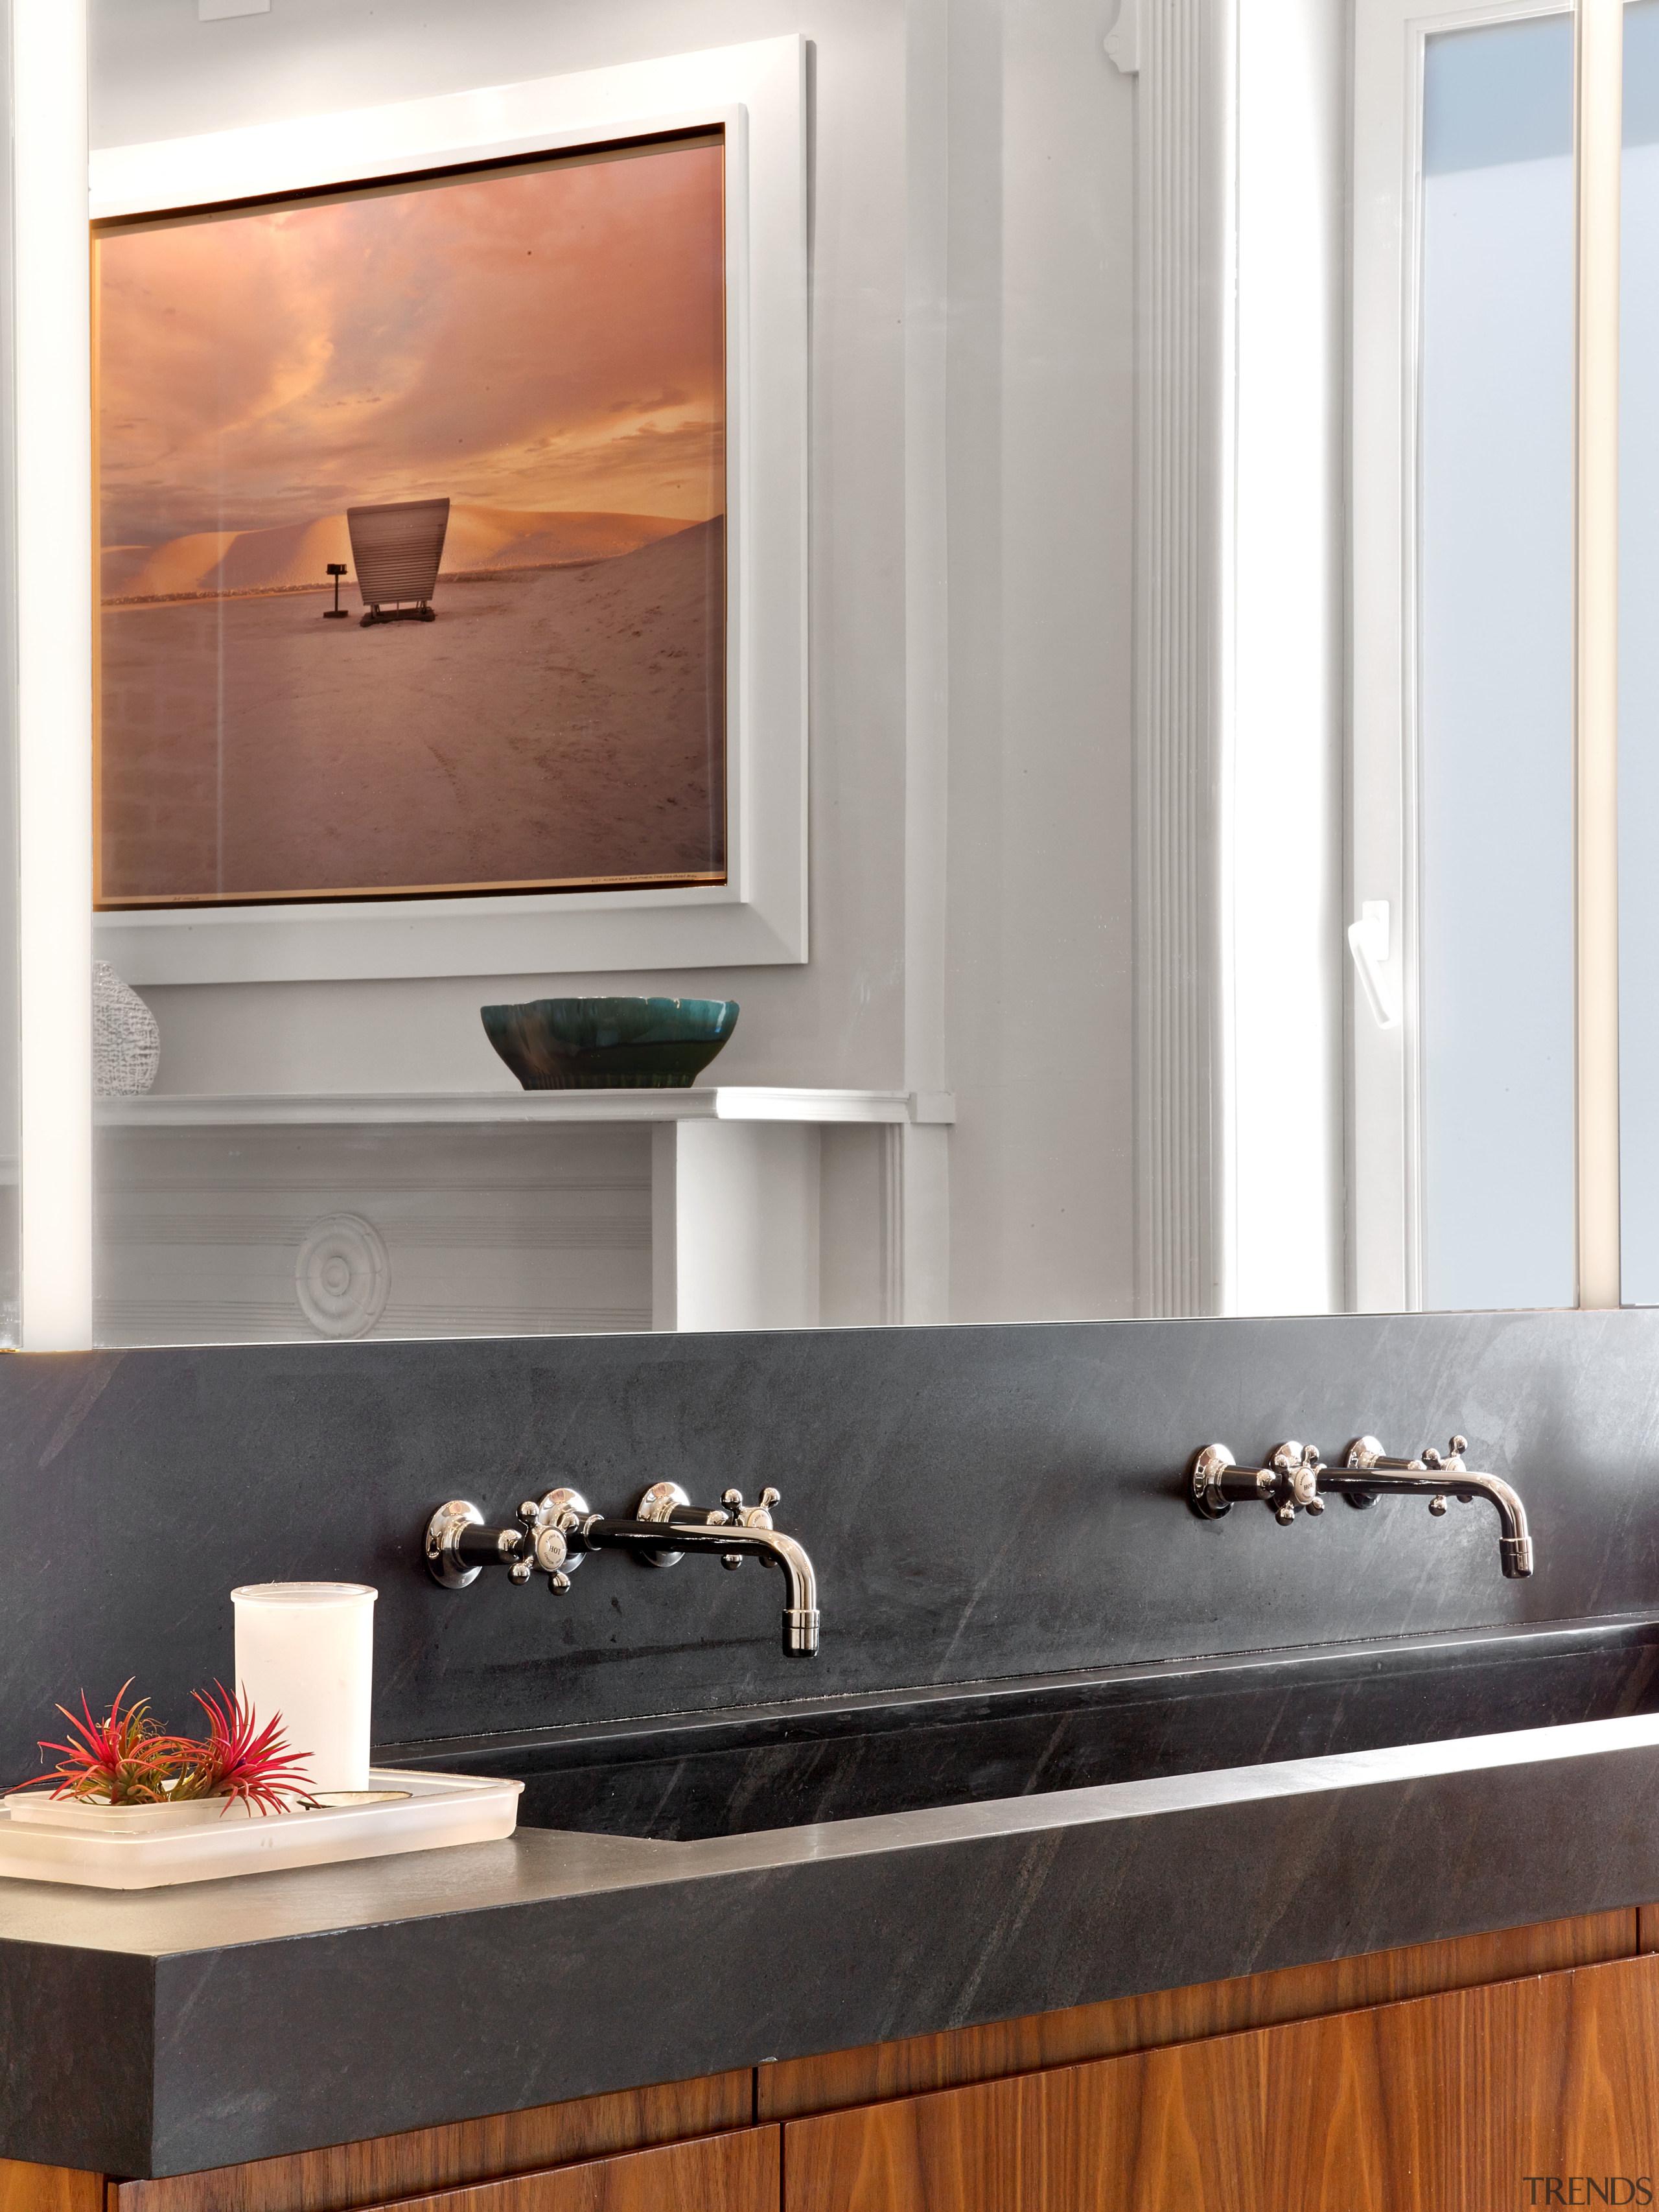 The top of this double vanity is in bathroom, countertop, floor, flooring, interior design, room, sink, tap, wall, white